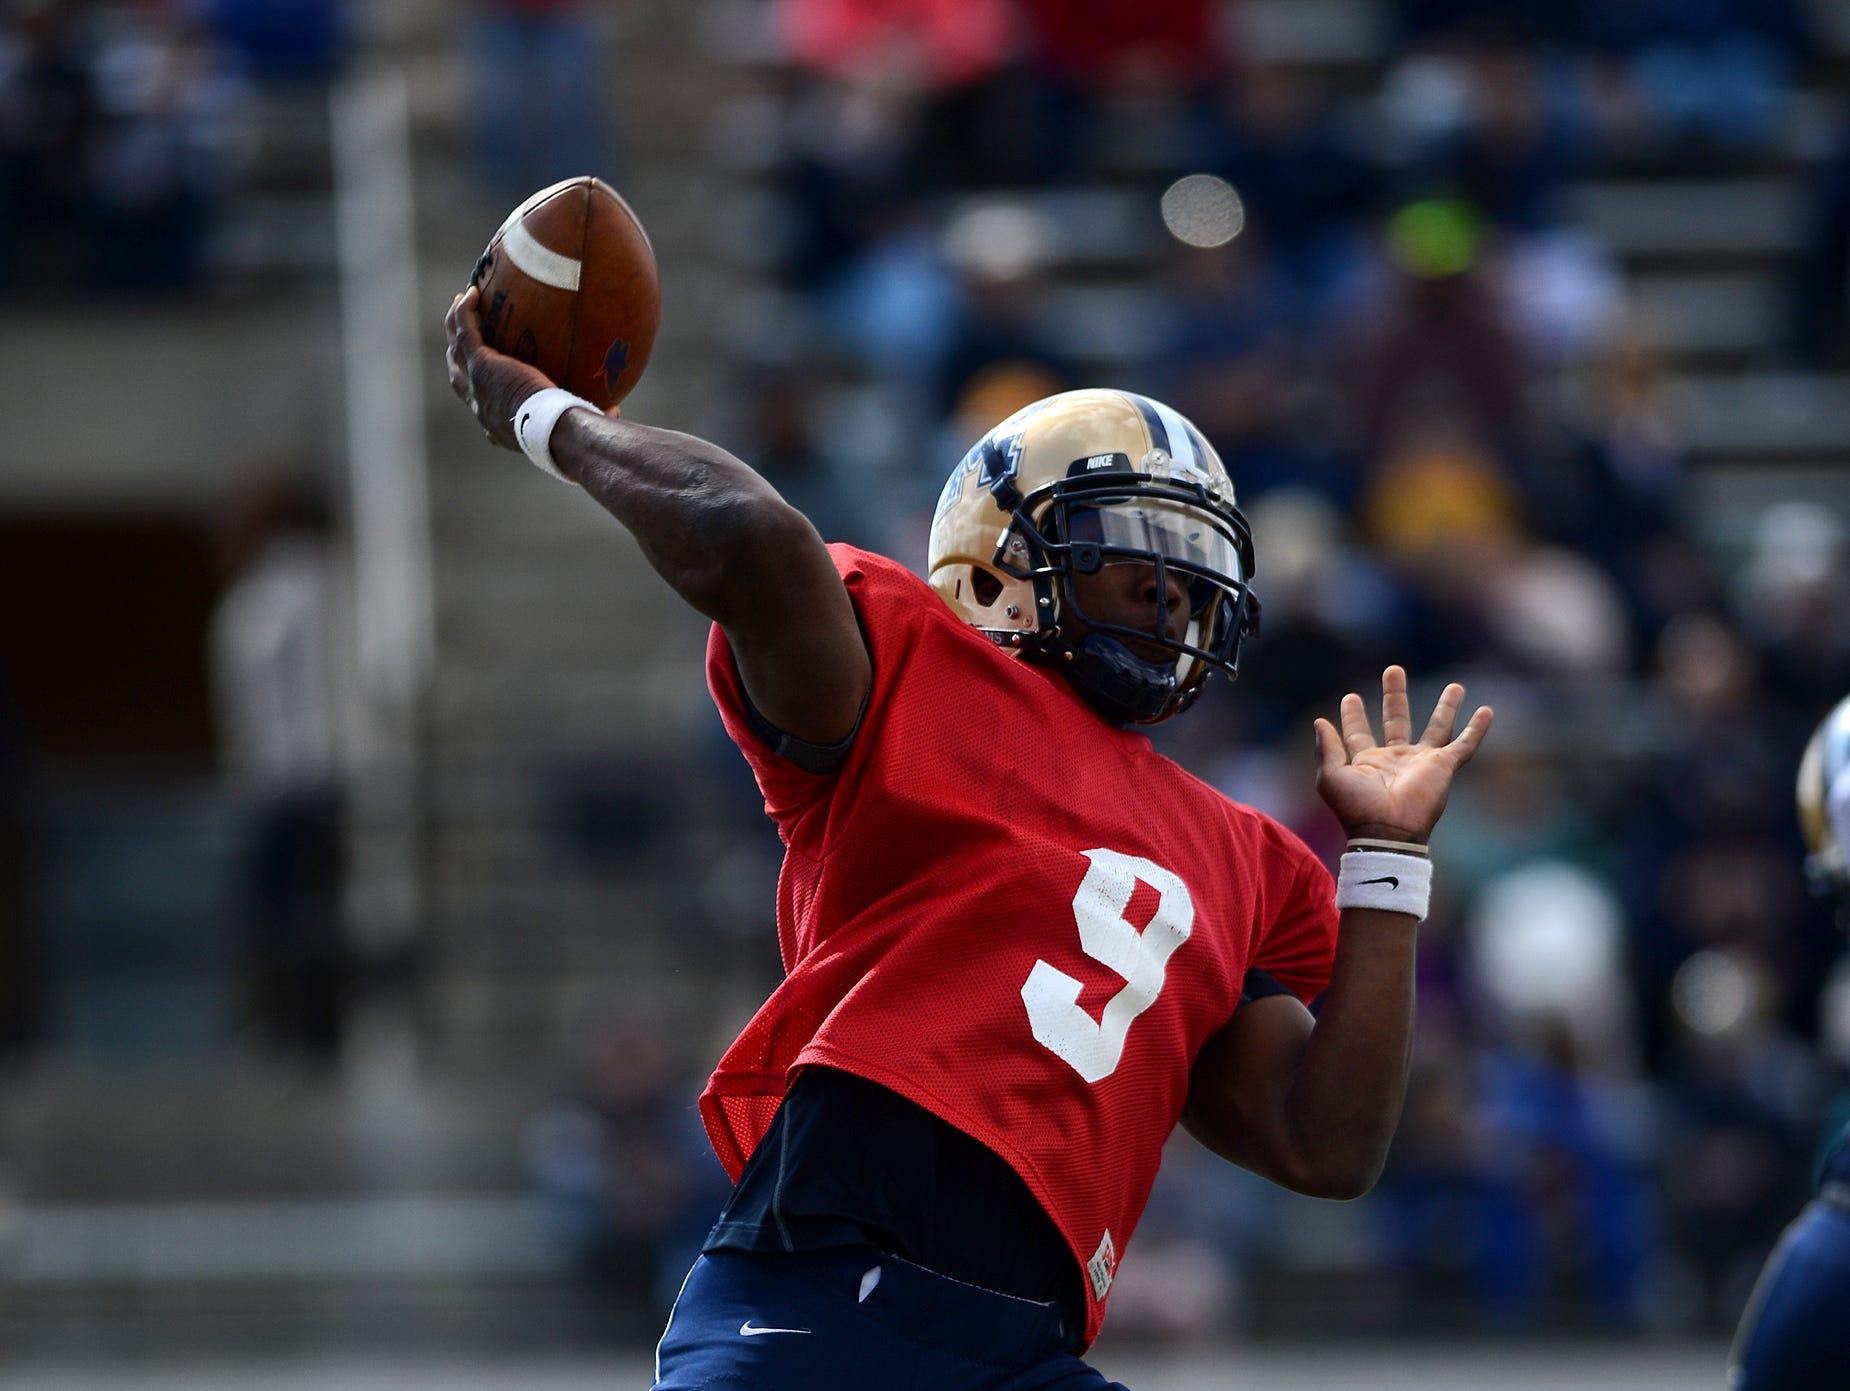 MSU quarterback DeNarius McGhee throws downfield on Saturday during the Triangle Classic.TRIBUNE PHOTO/RION SANDERS